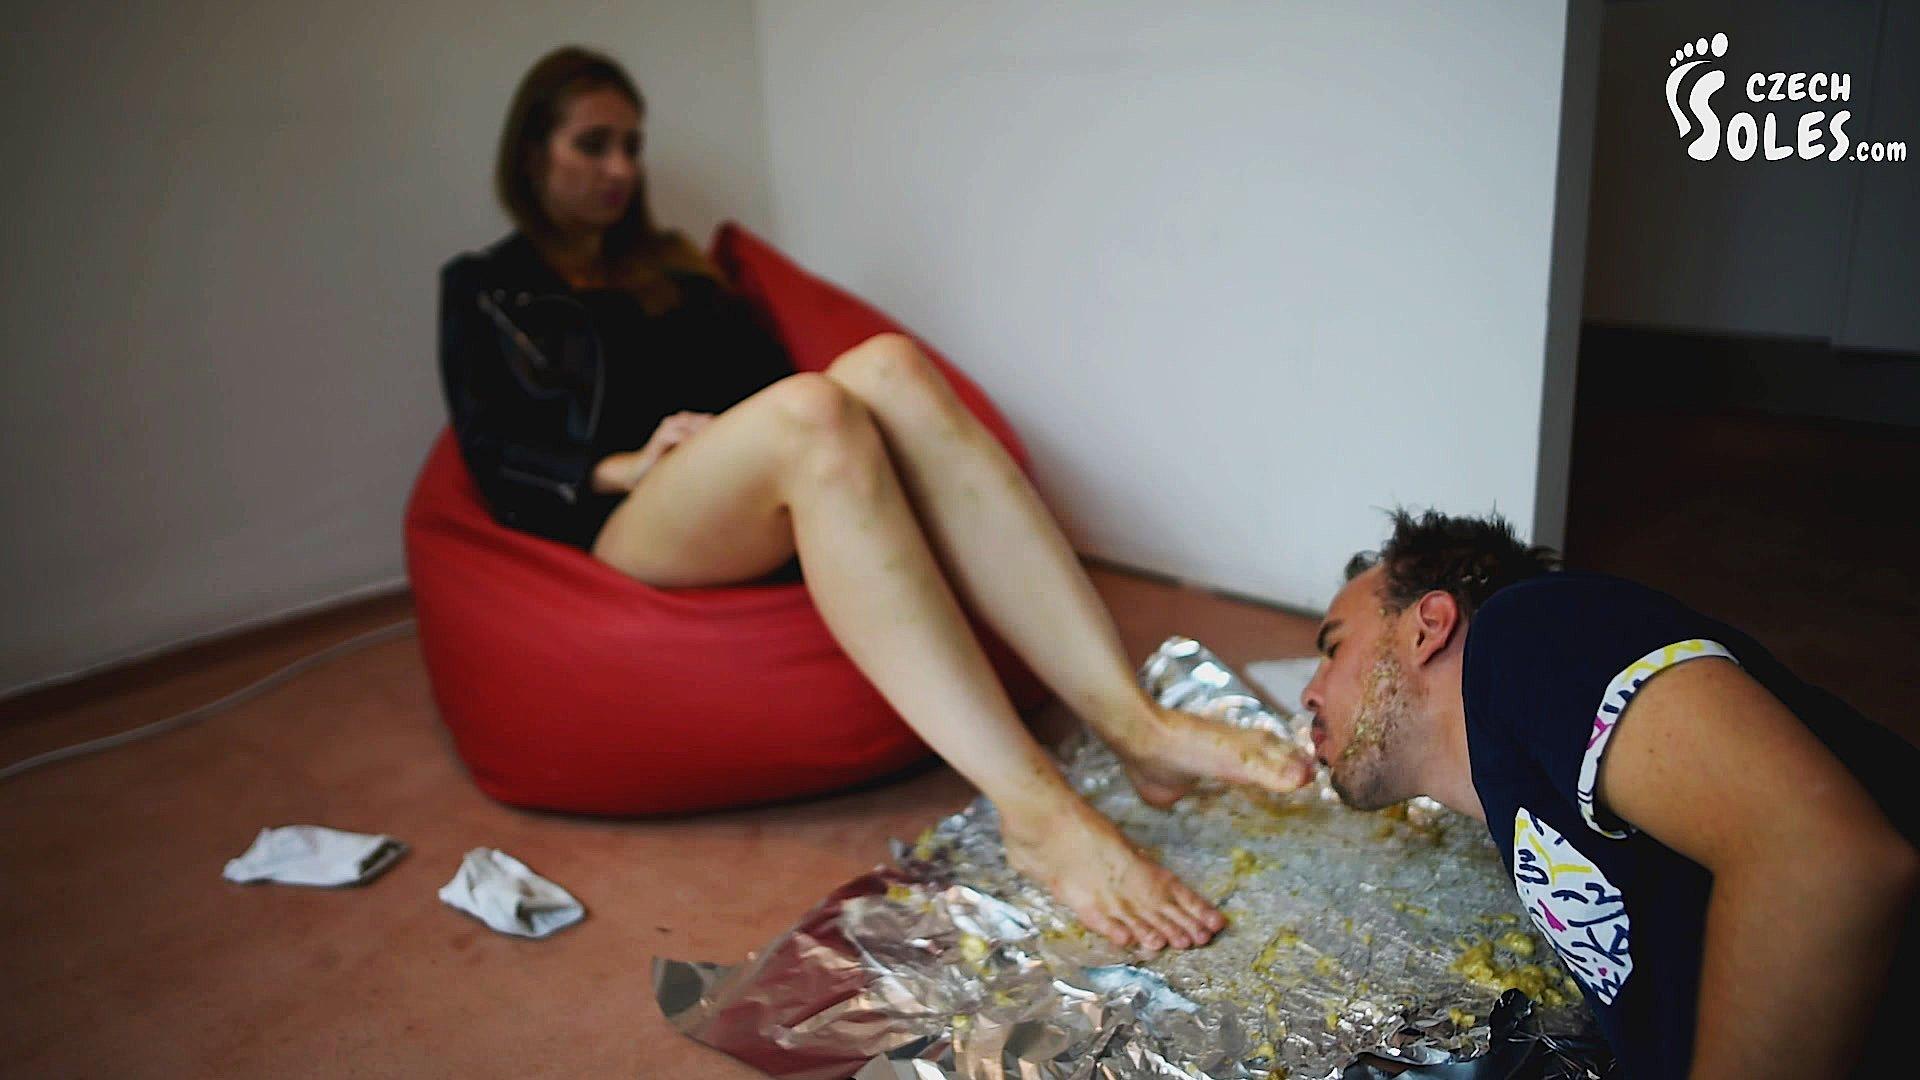 Foot worship food play lit erotica